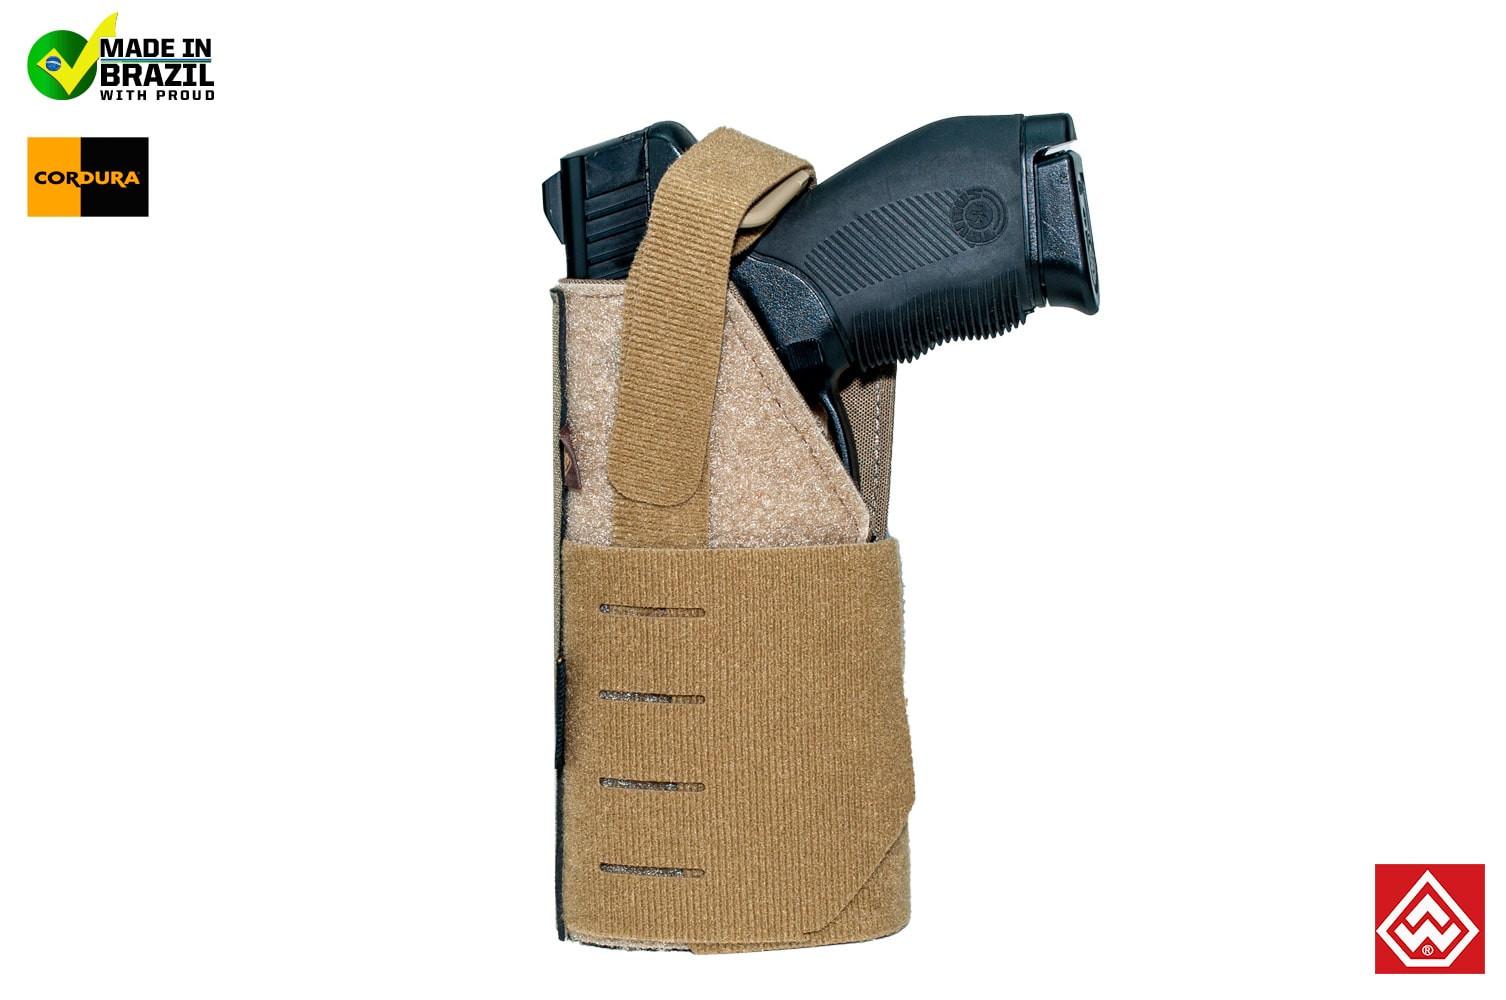 Coldre Police MOLLE Canhoto para Pistola - Coyote